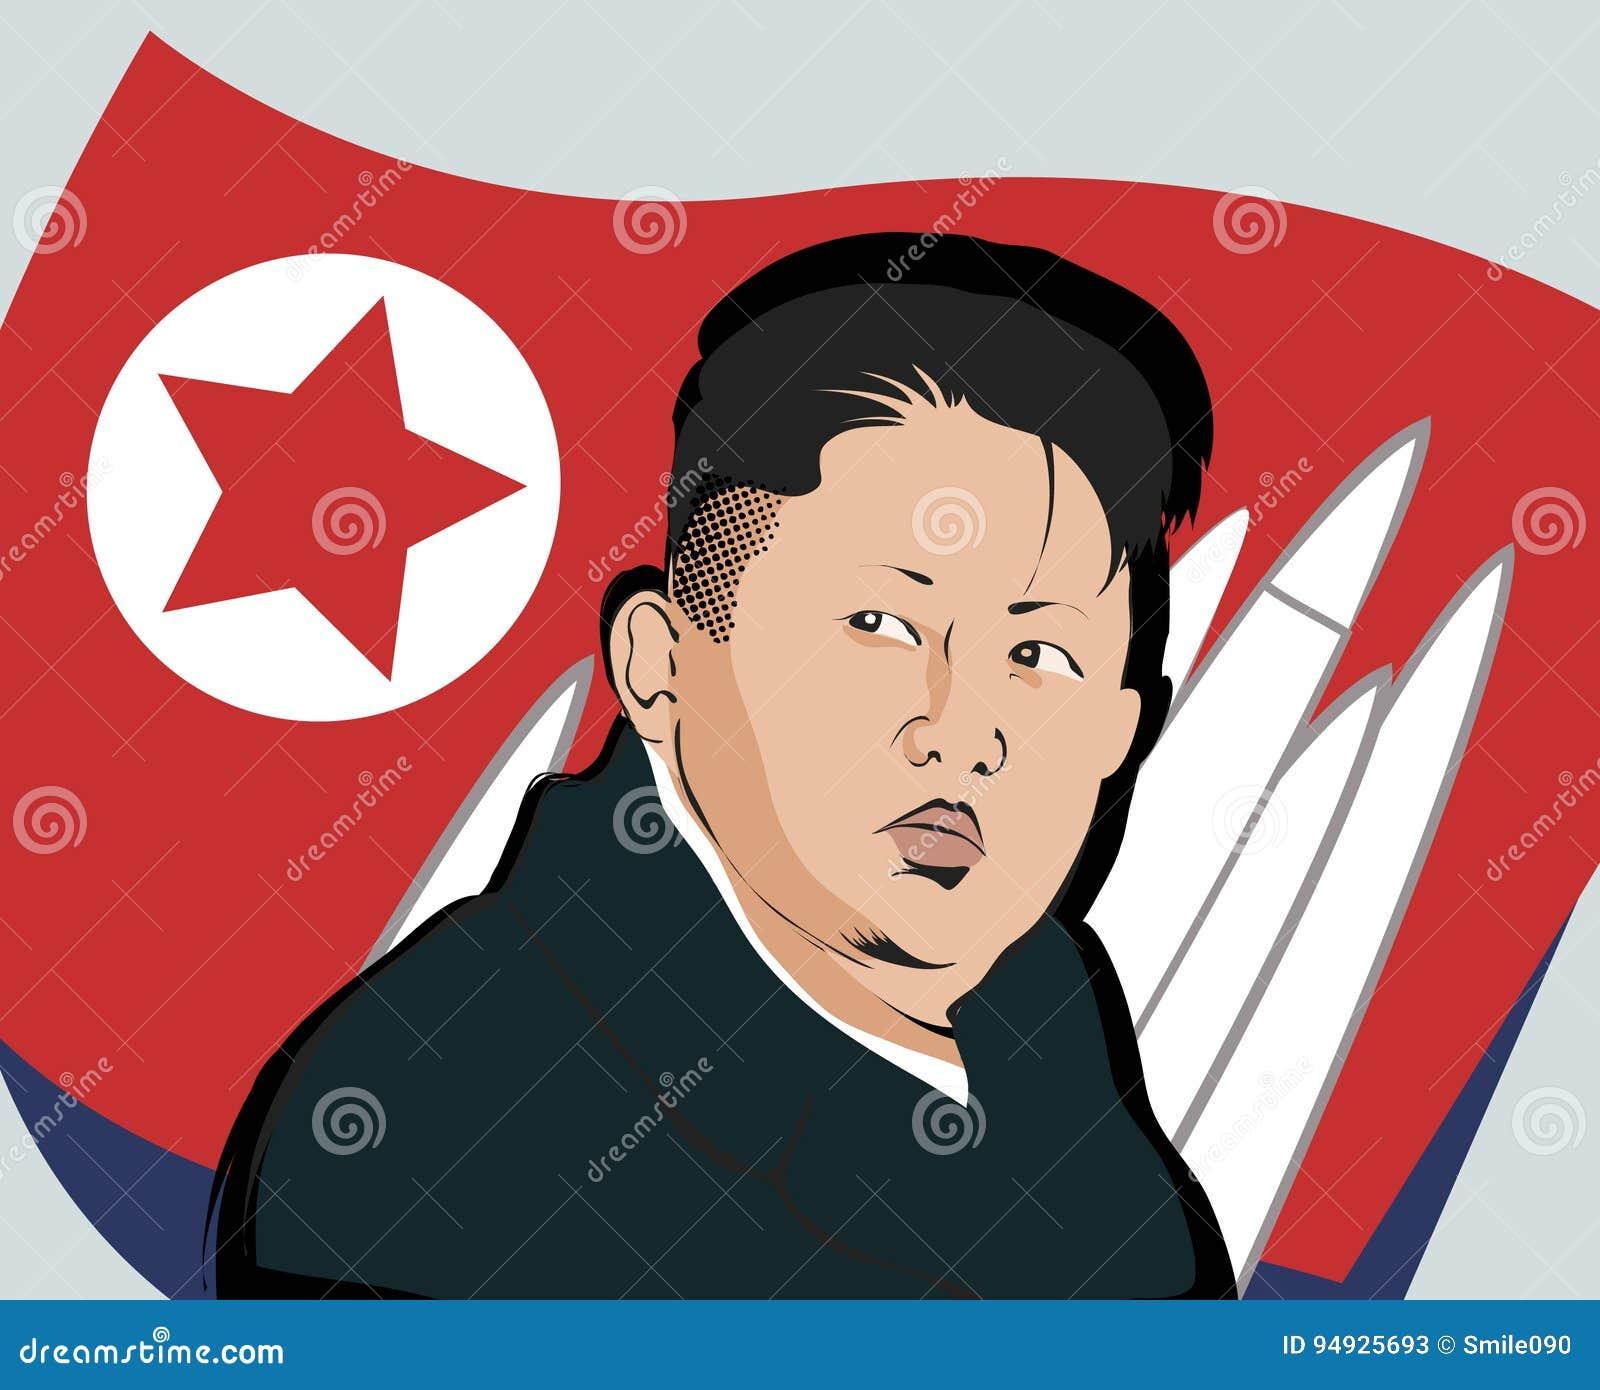 17 Kim Kwiecień 2017, UN